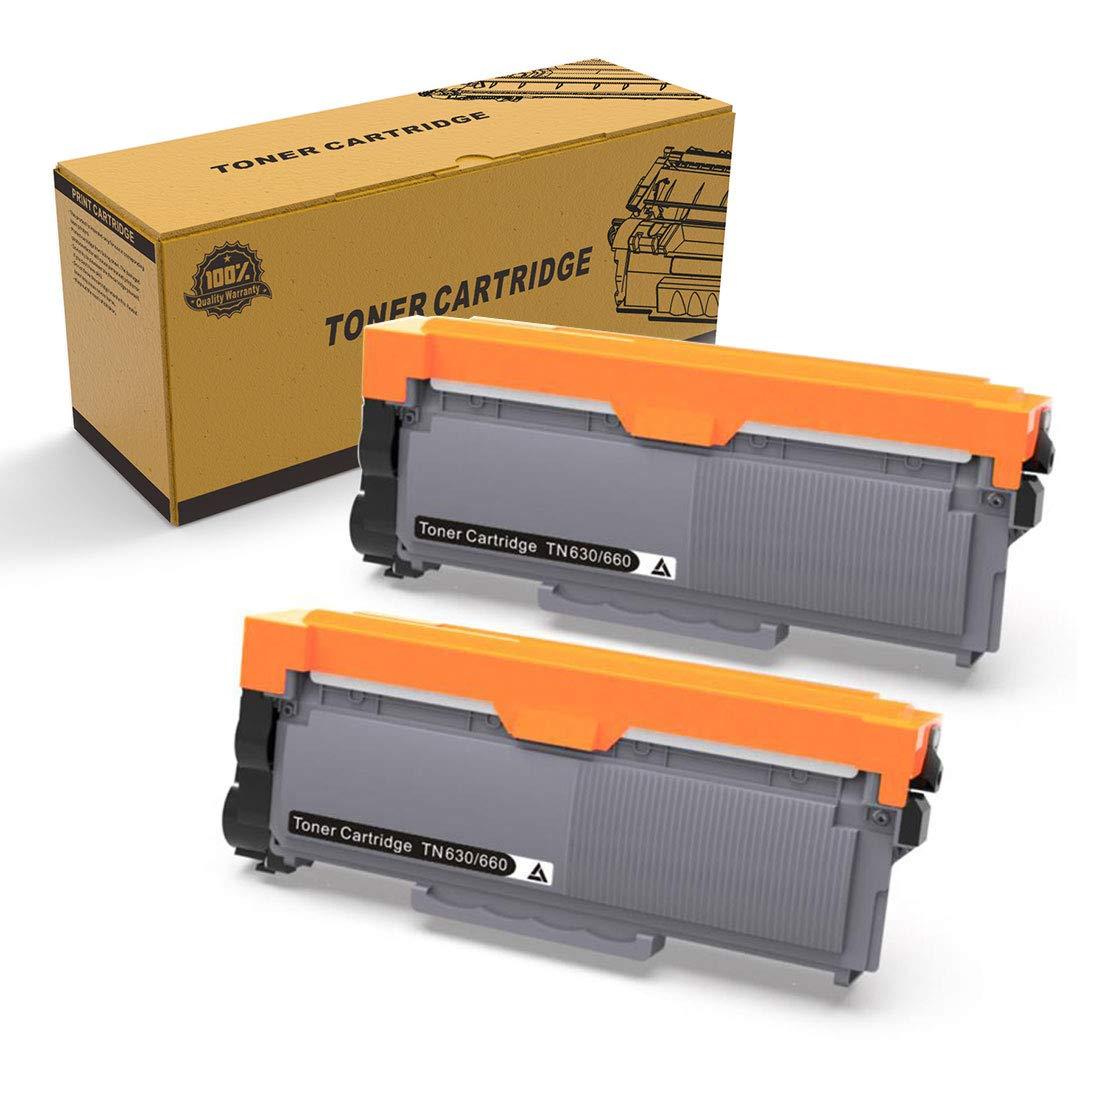 Compatible Toner Cartridge Replacement for Brother TN660 TN-660 TN630 TN-630 2-Pack High Yield Toner Cartridges for MFC-L2740DW MFC-L2700DW MFC-L2720DW HL-L2380DW HL-L2360DW HL-L2300D